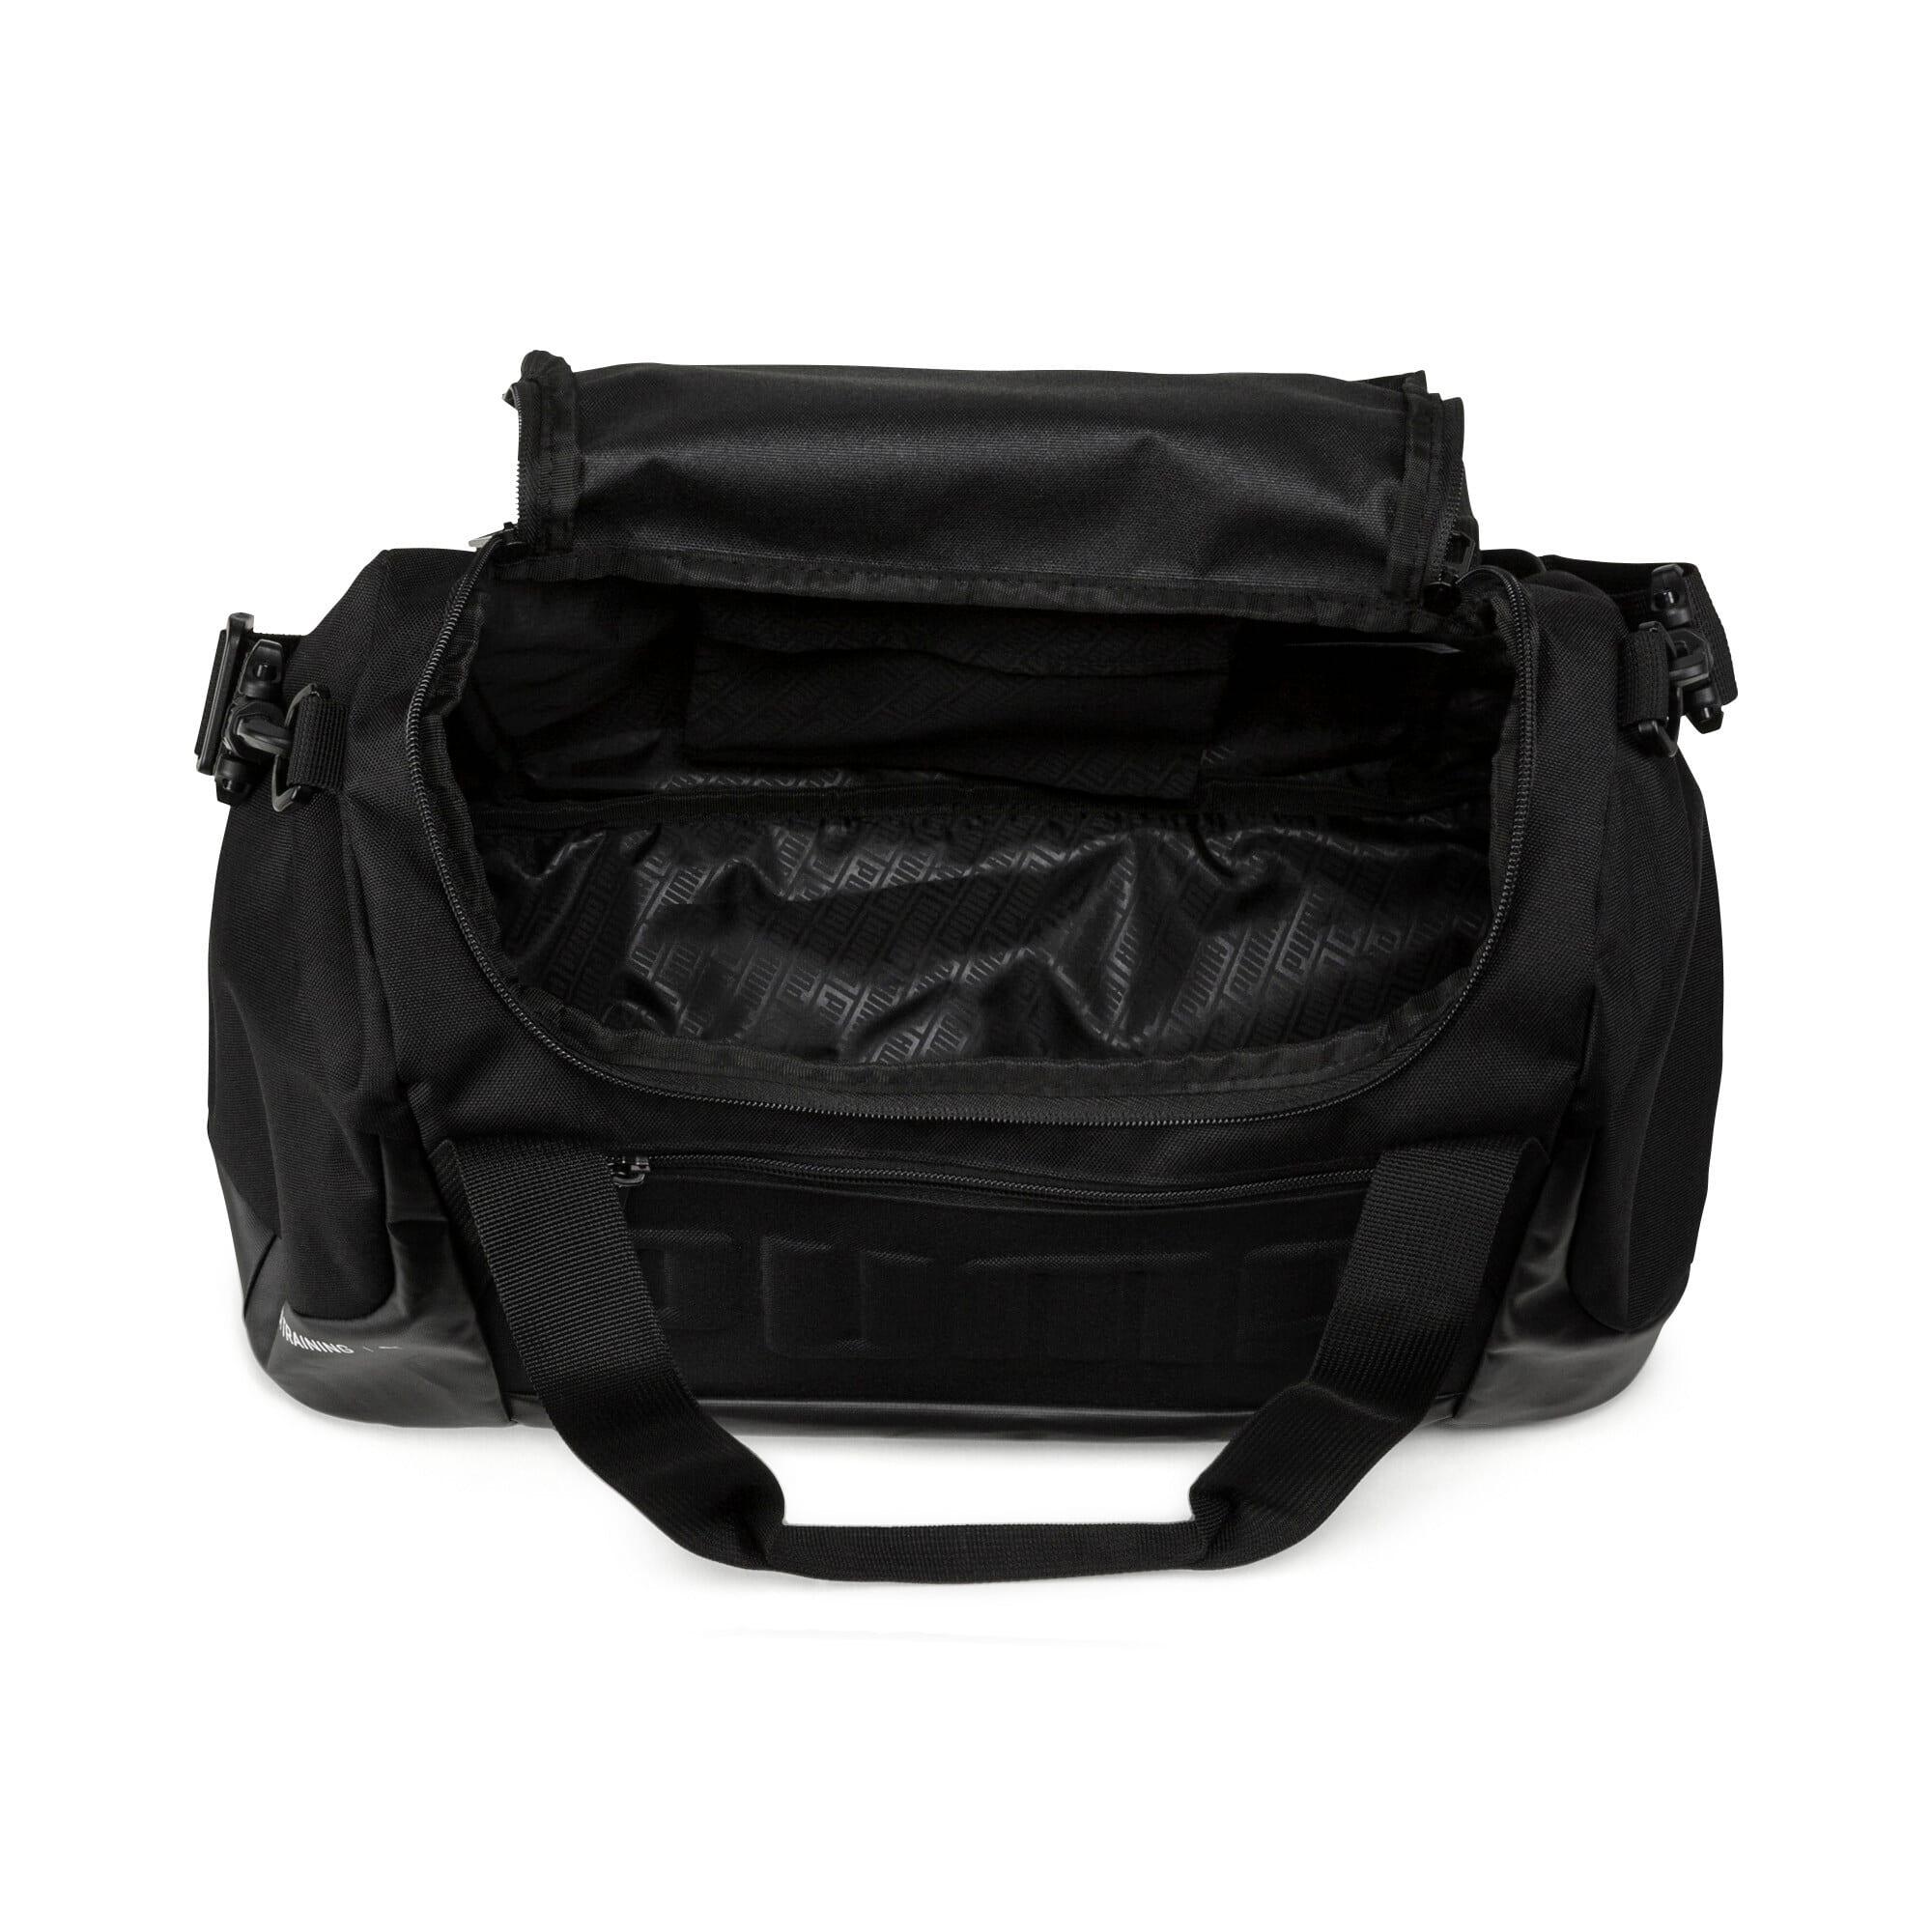 Thumbnail 3 of Gym Duffel Bag, Puma Black, medium-IND